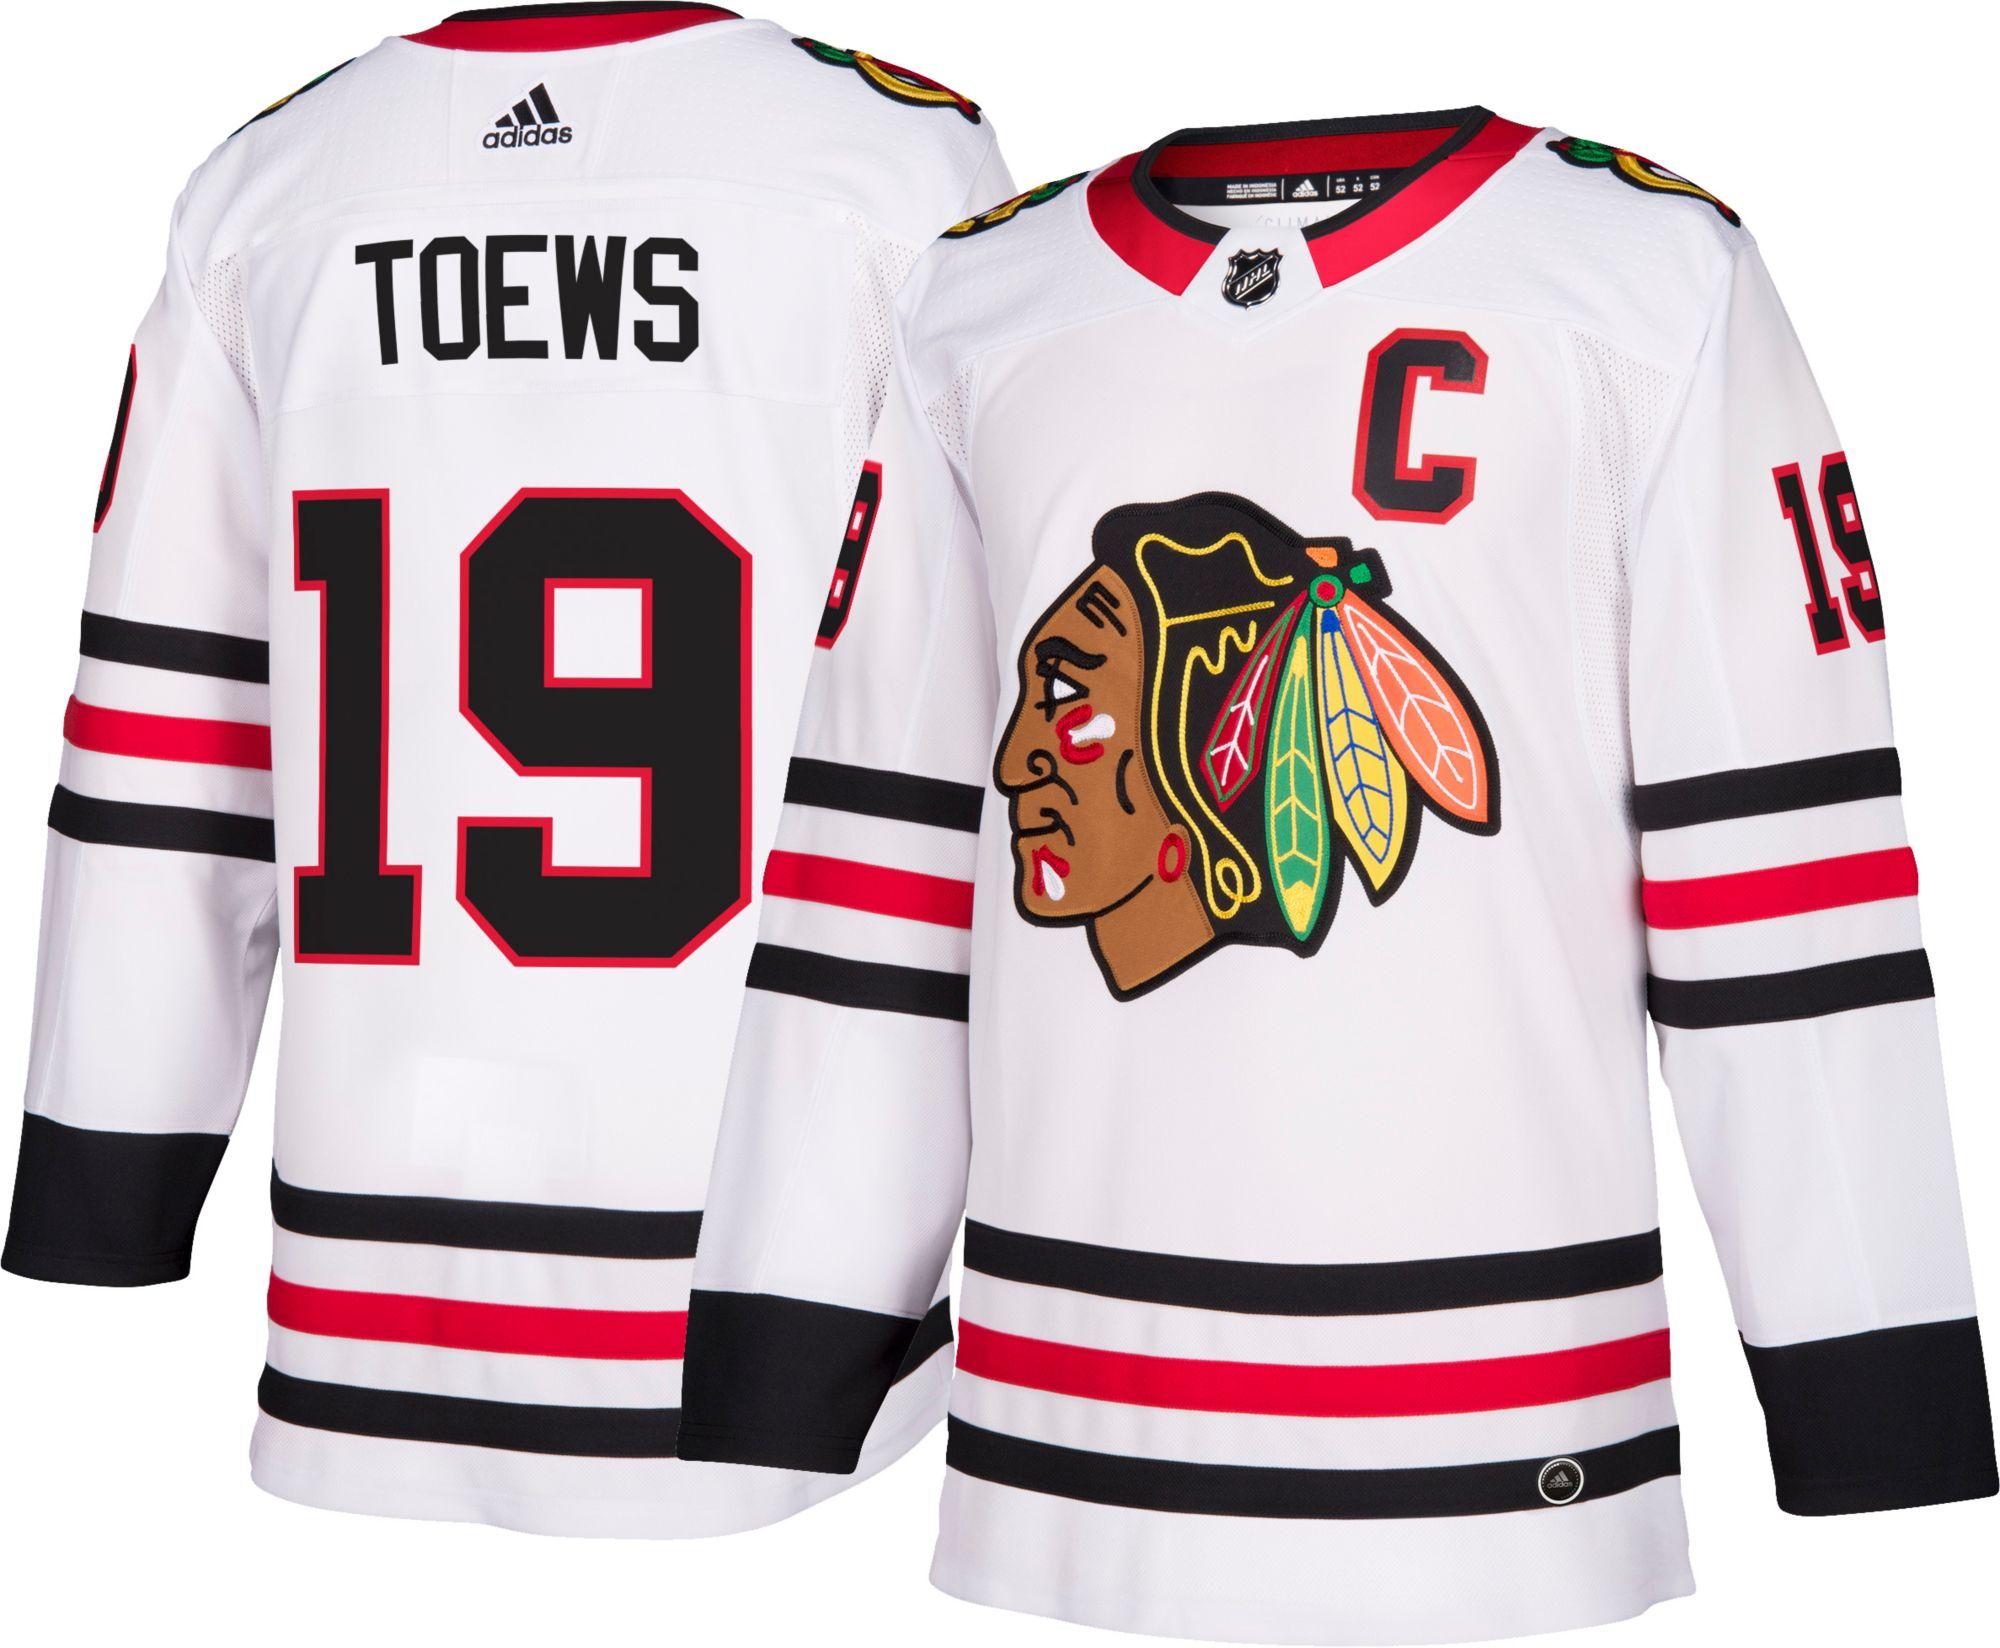 adidas uomini chicago blackhawks jonathan toews 19 autentico pro